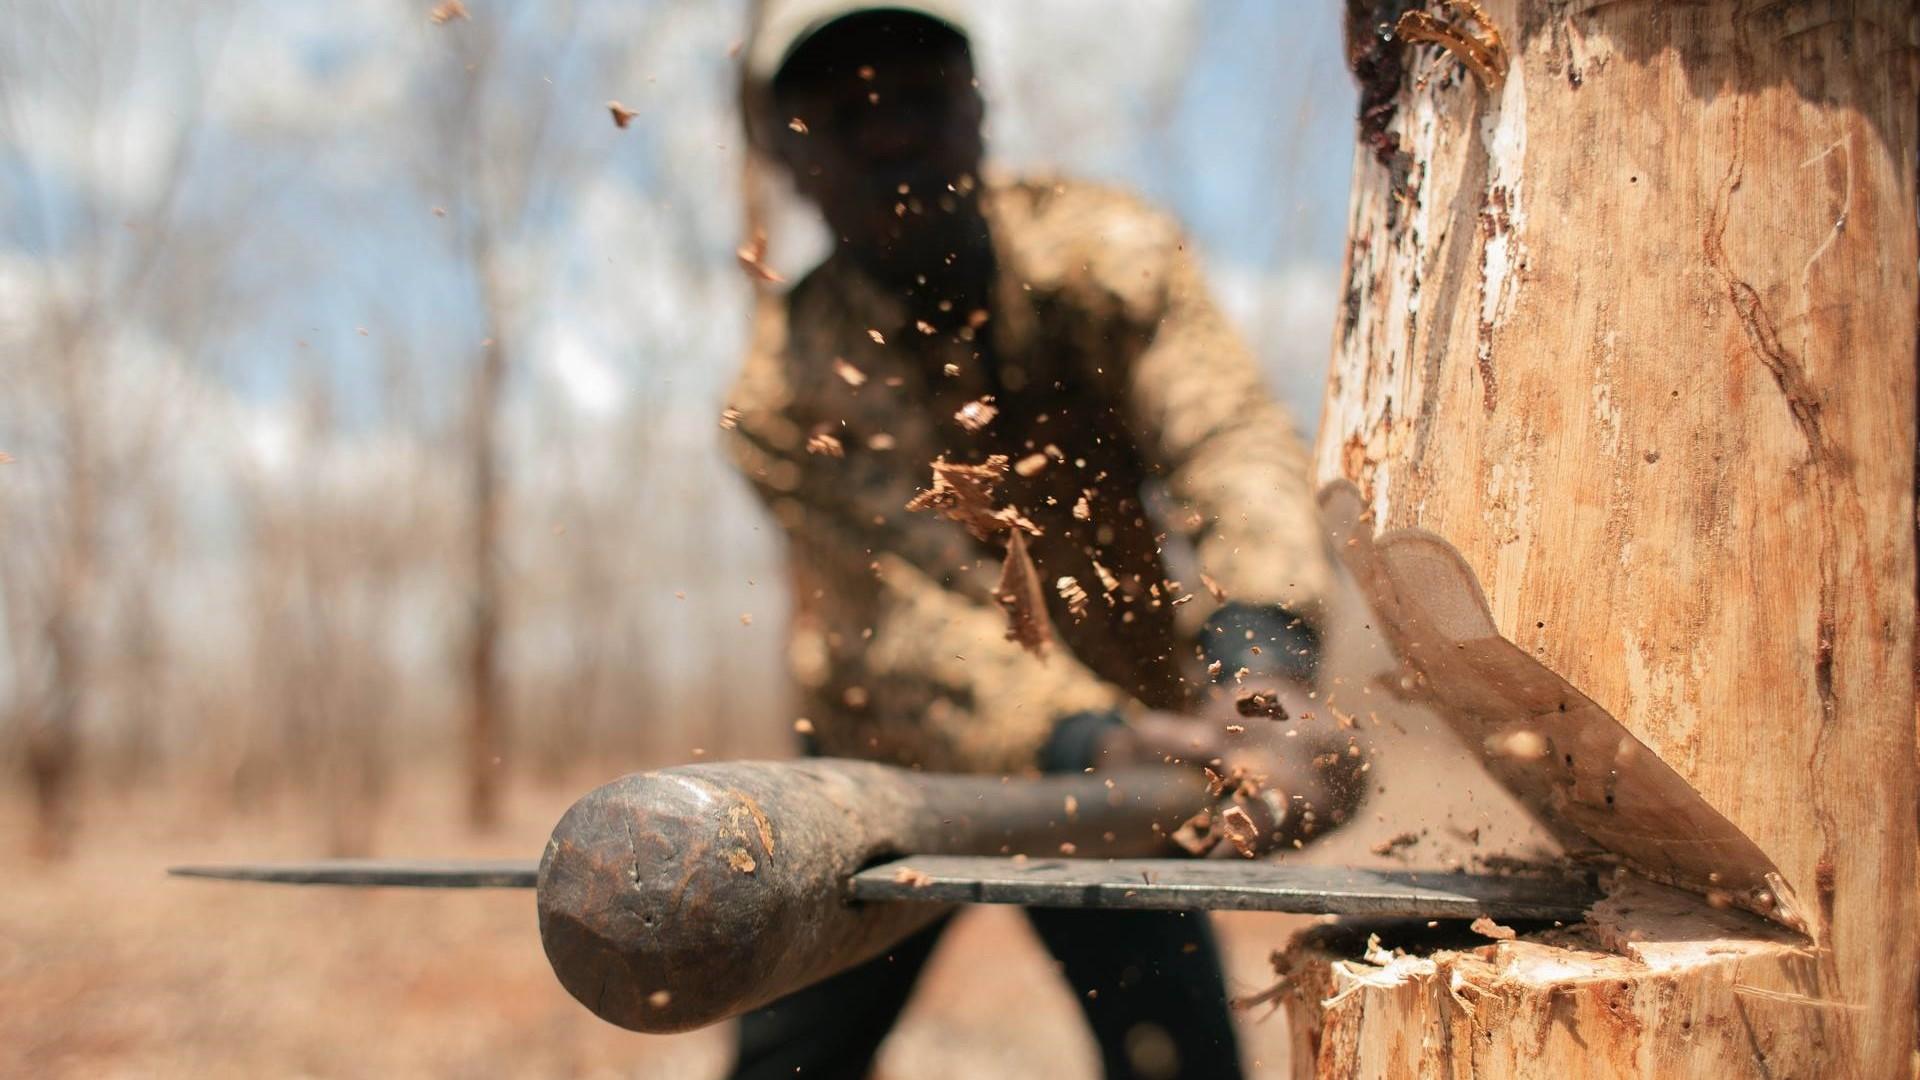 ощущения картинки лесорубы рубят лес конце марта разработчики